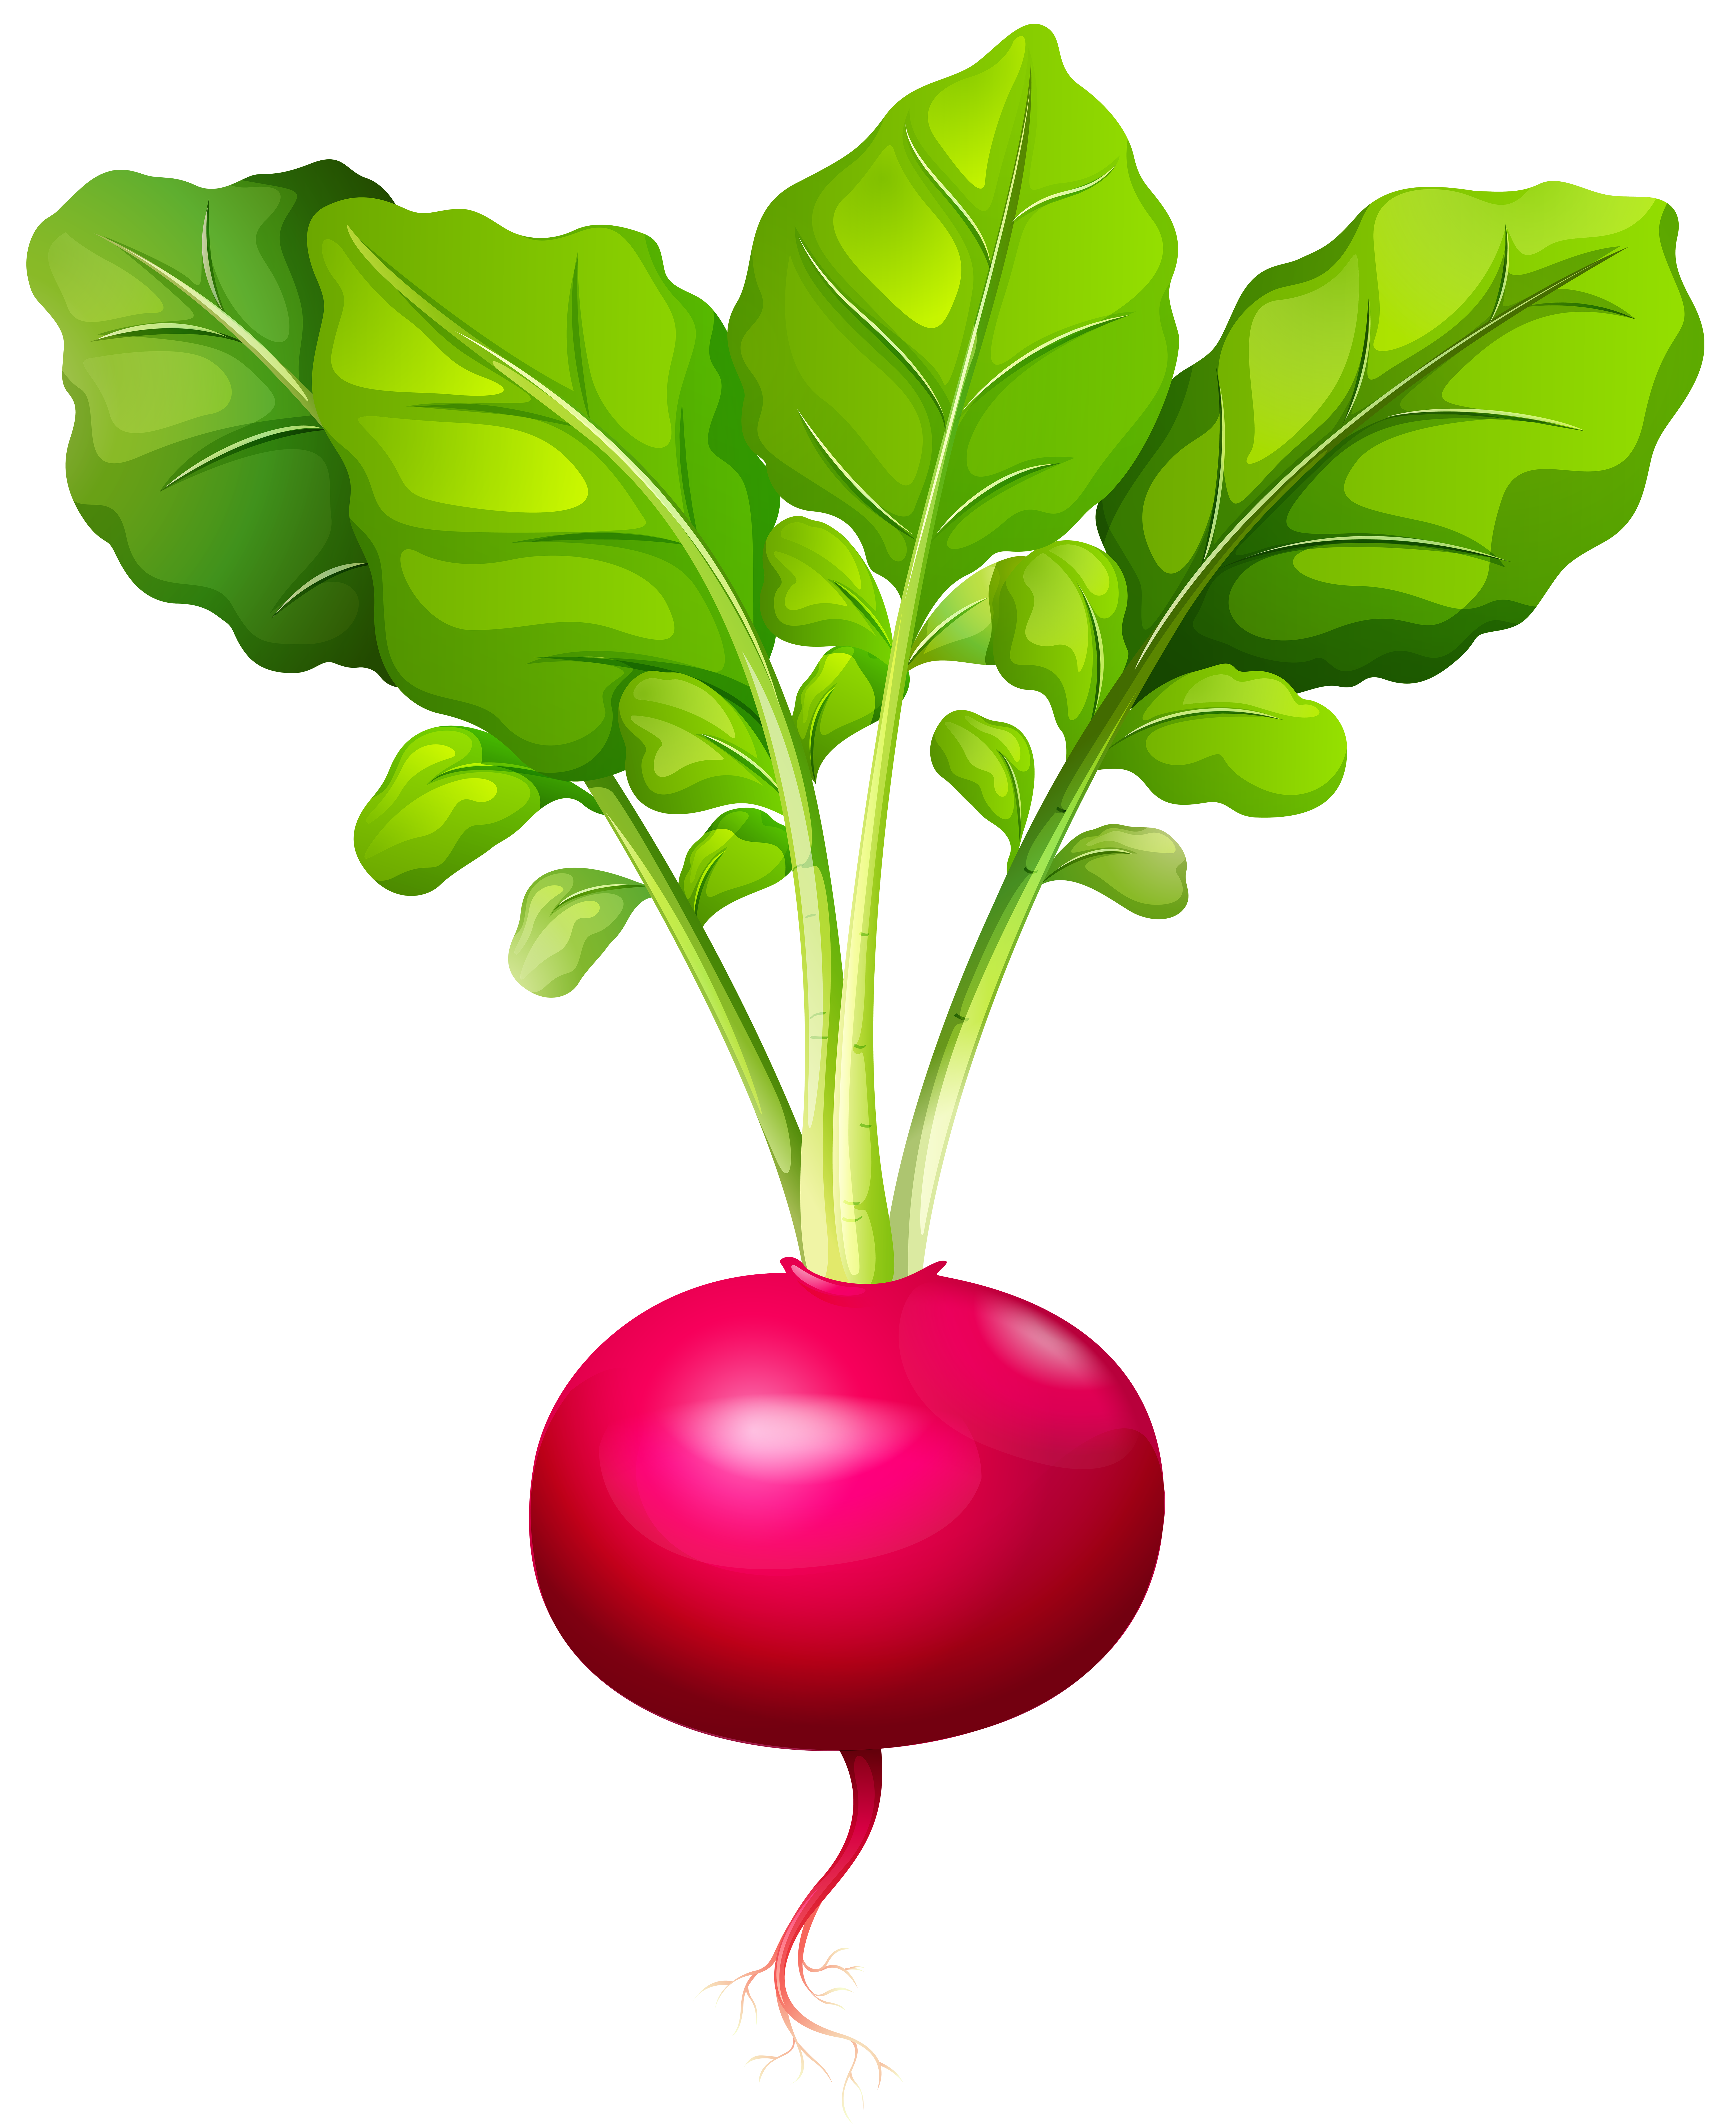 Vegetables clipart turnip. Radish png clip art